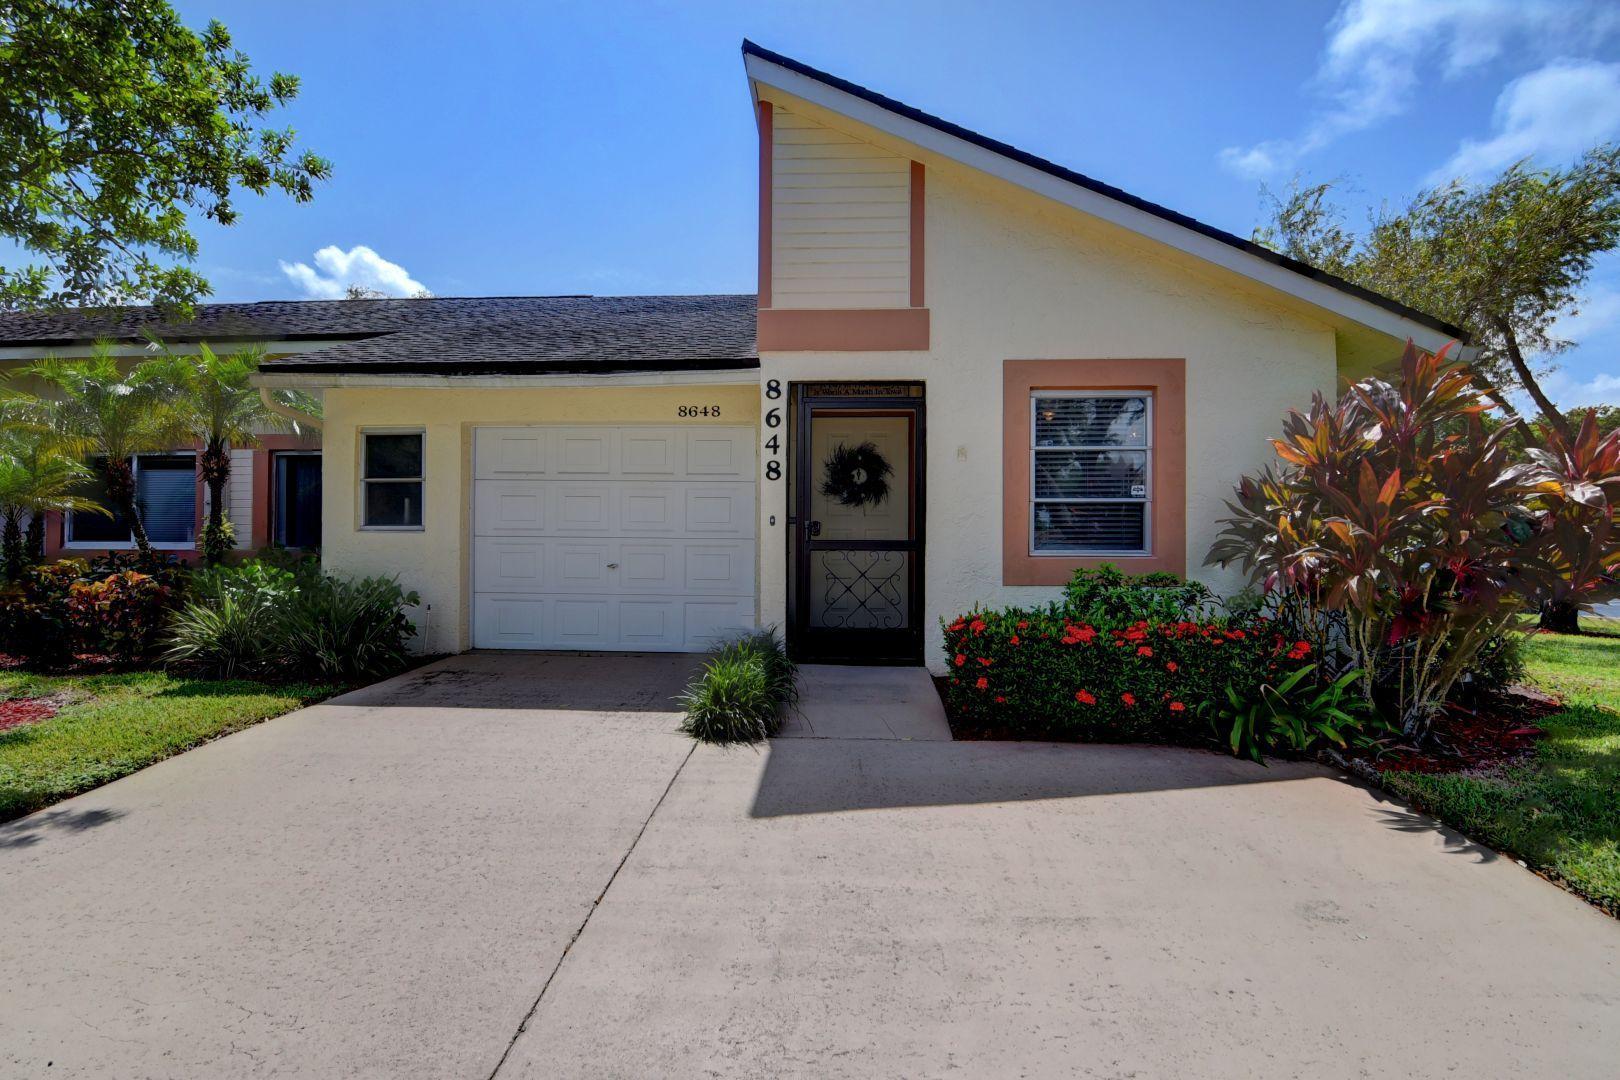 8648 Flamingo Drive Boca Raton, FL 33496